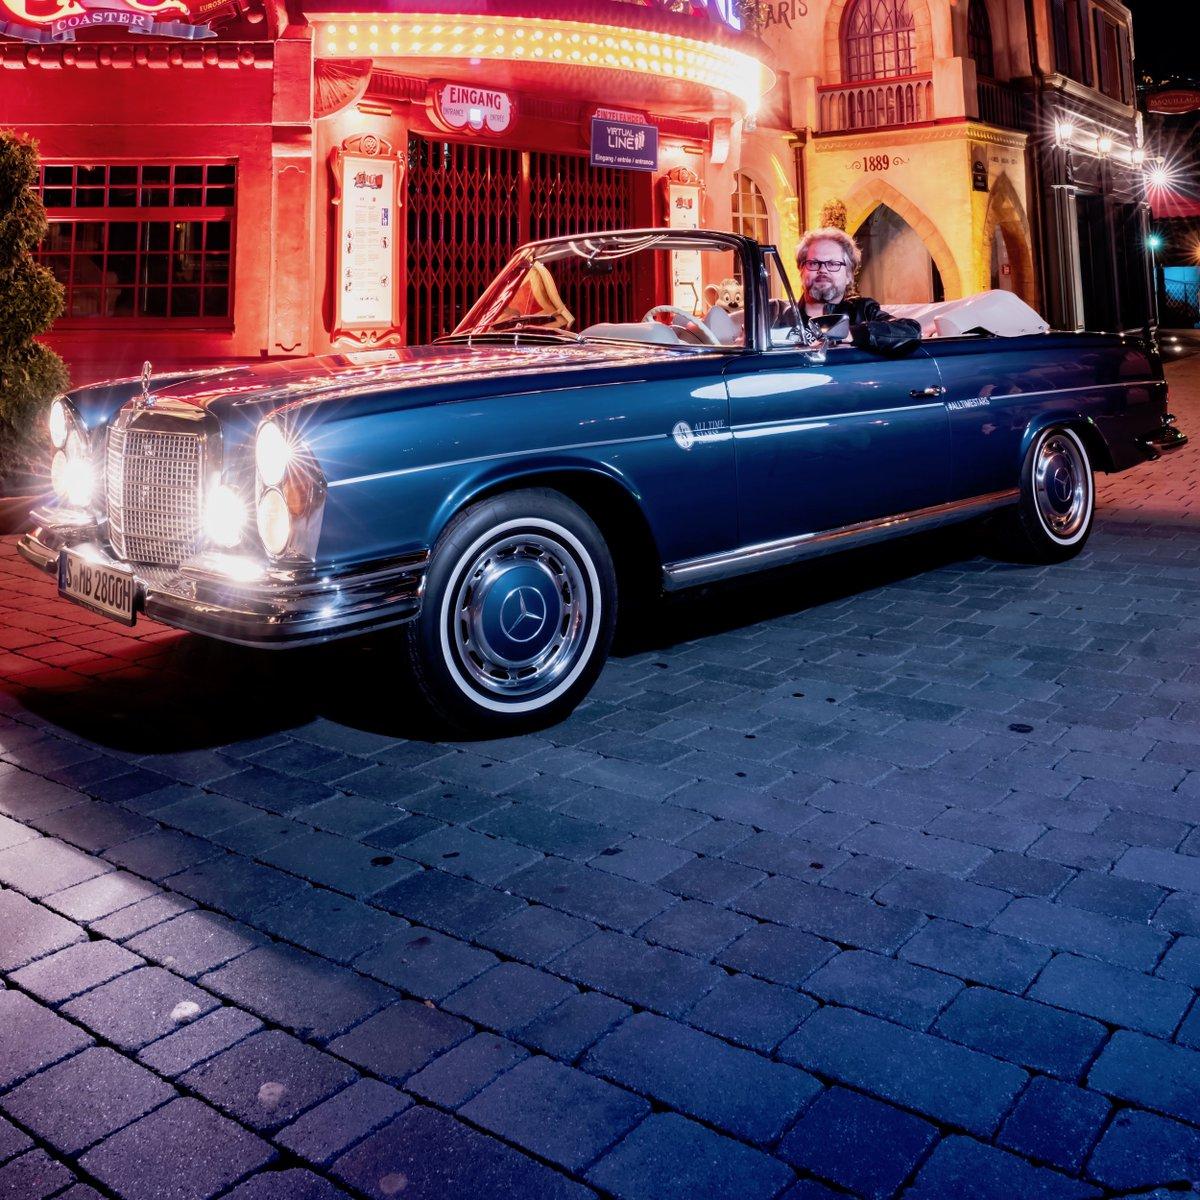 One of our most legendary models and a Mercedes-Benz All Time Star!  📷 Crewten @europa_park #MercedesBenz #Alltimestars #280SE #cabriolet #Mercedes #Benz https://t.co/ybb00nJL98